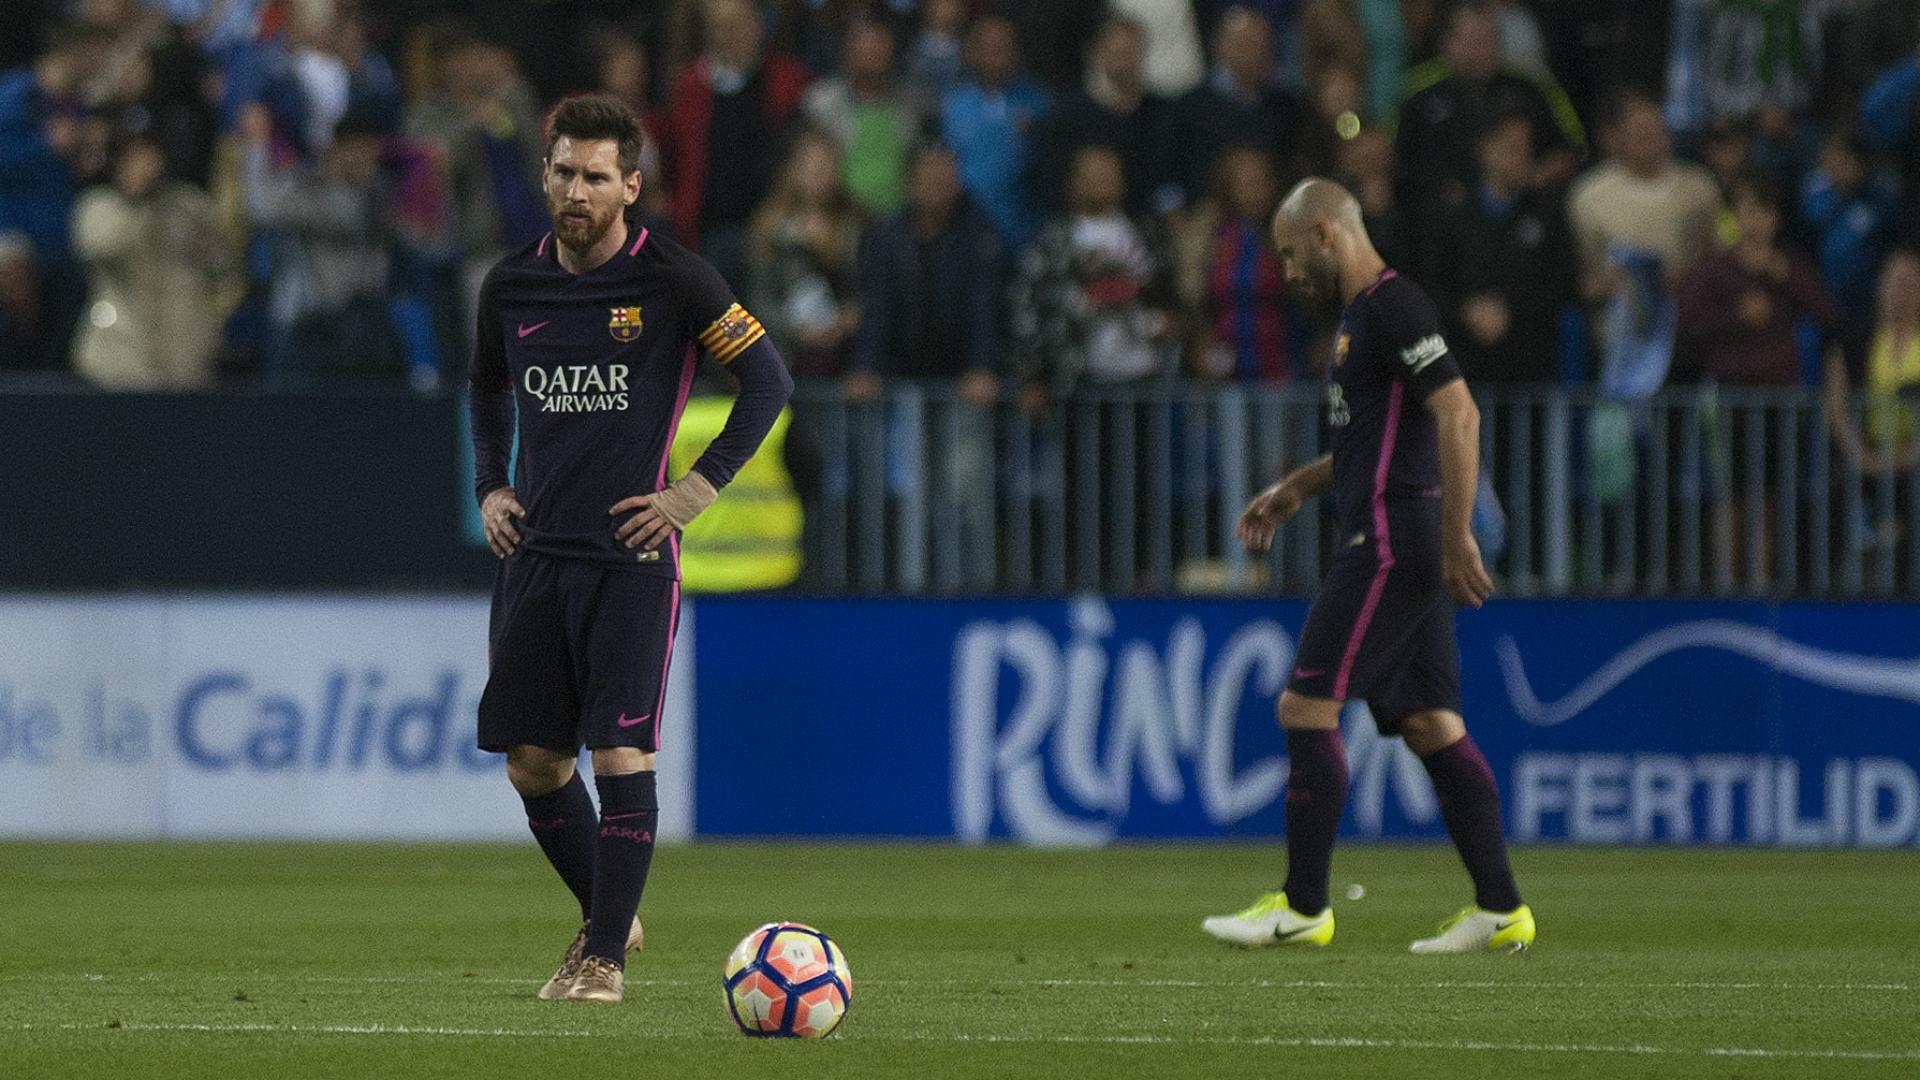 Liga: il Barcellona crolla 2-0 a Malaga. Espulso Neymar